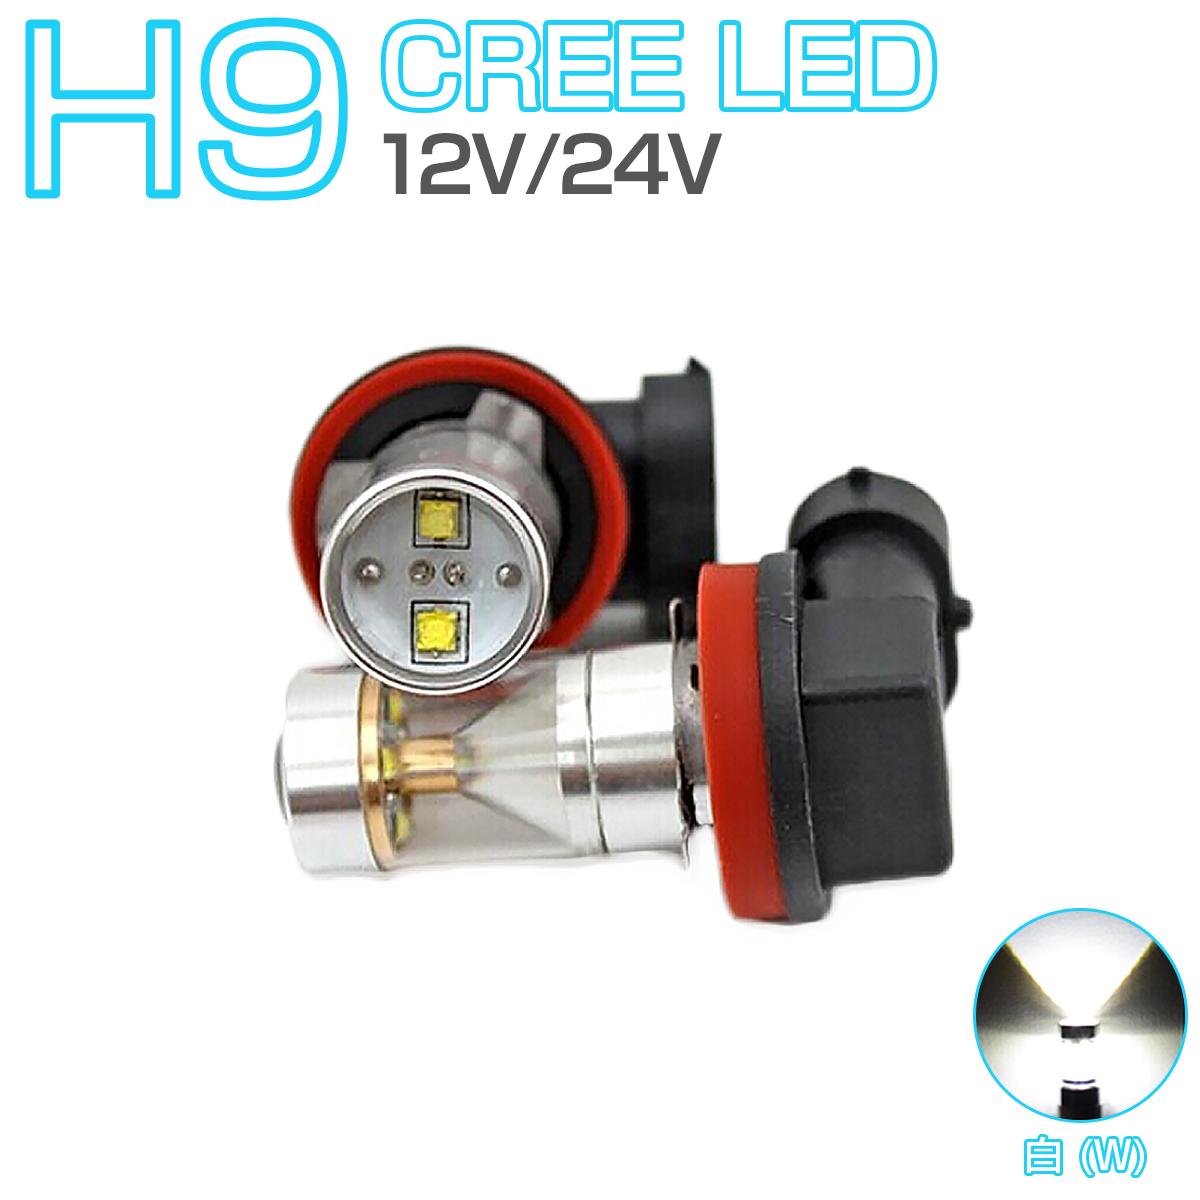 LED H9 ホワイト白発光 30W CREEチップ フォグランプ ブレーキ ウインカー バックランプ 2個入り 12V 24V SDM便送料無料 在庫処分1ヶ月保証